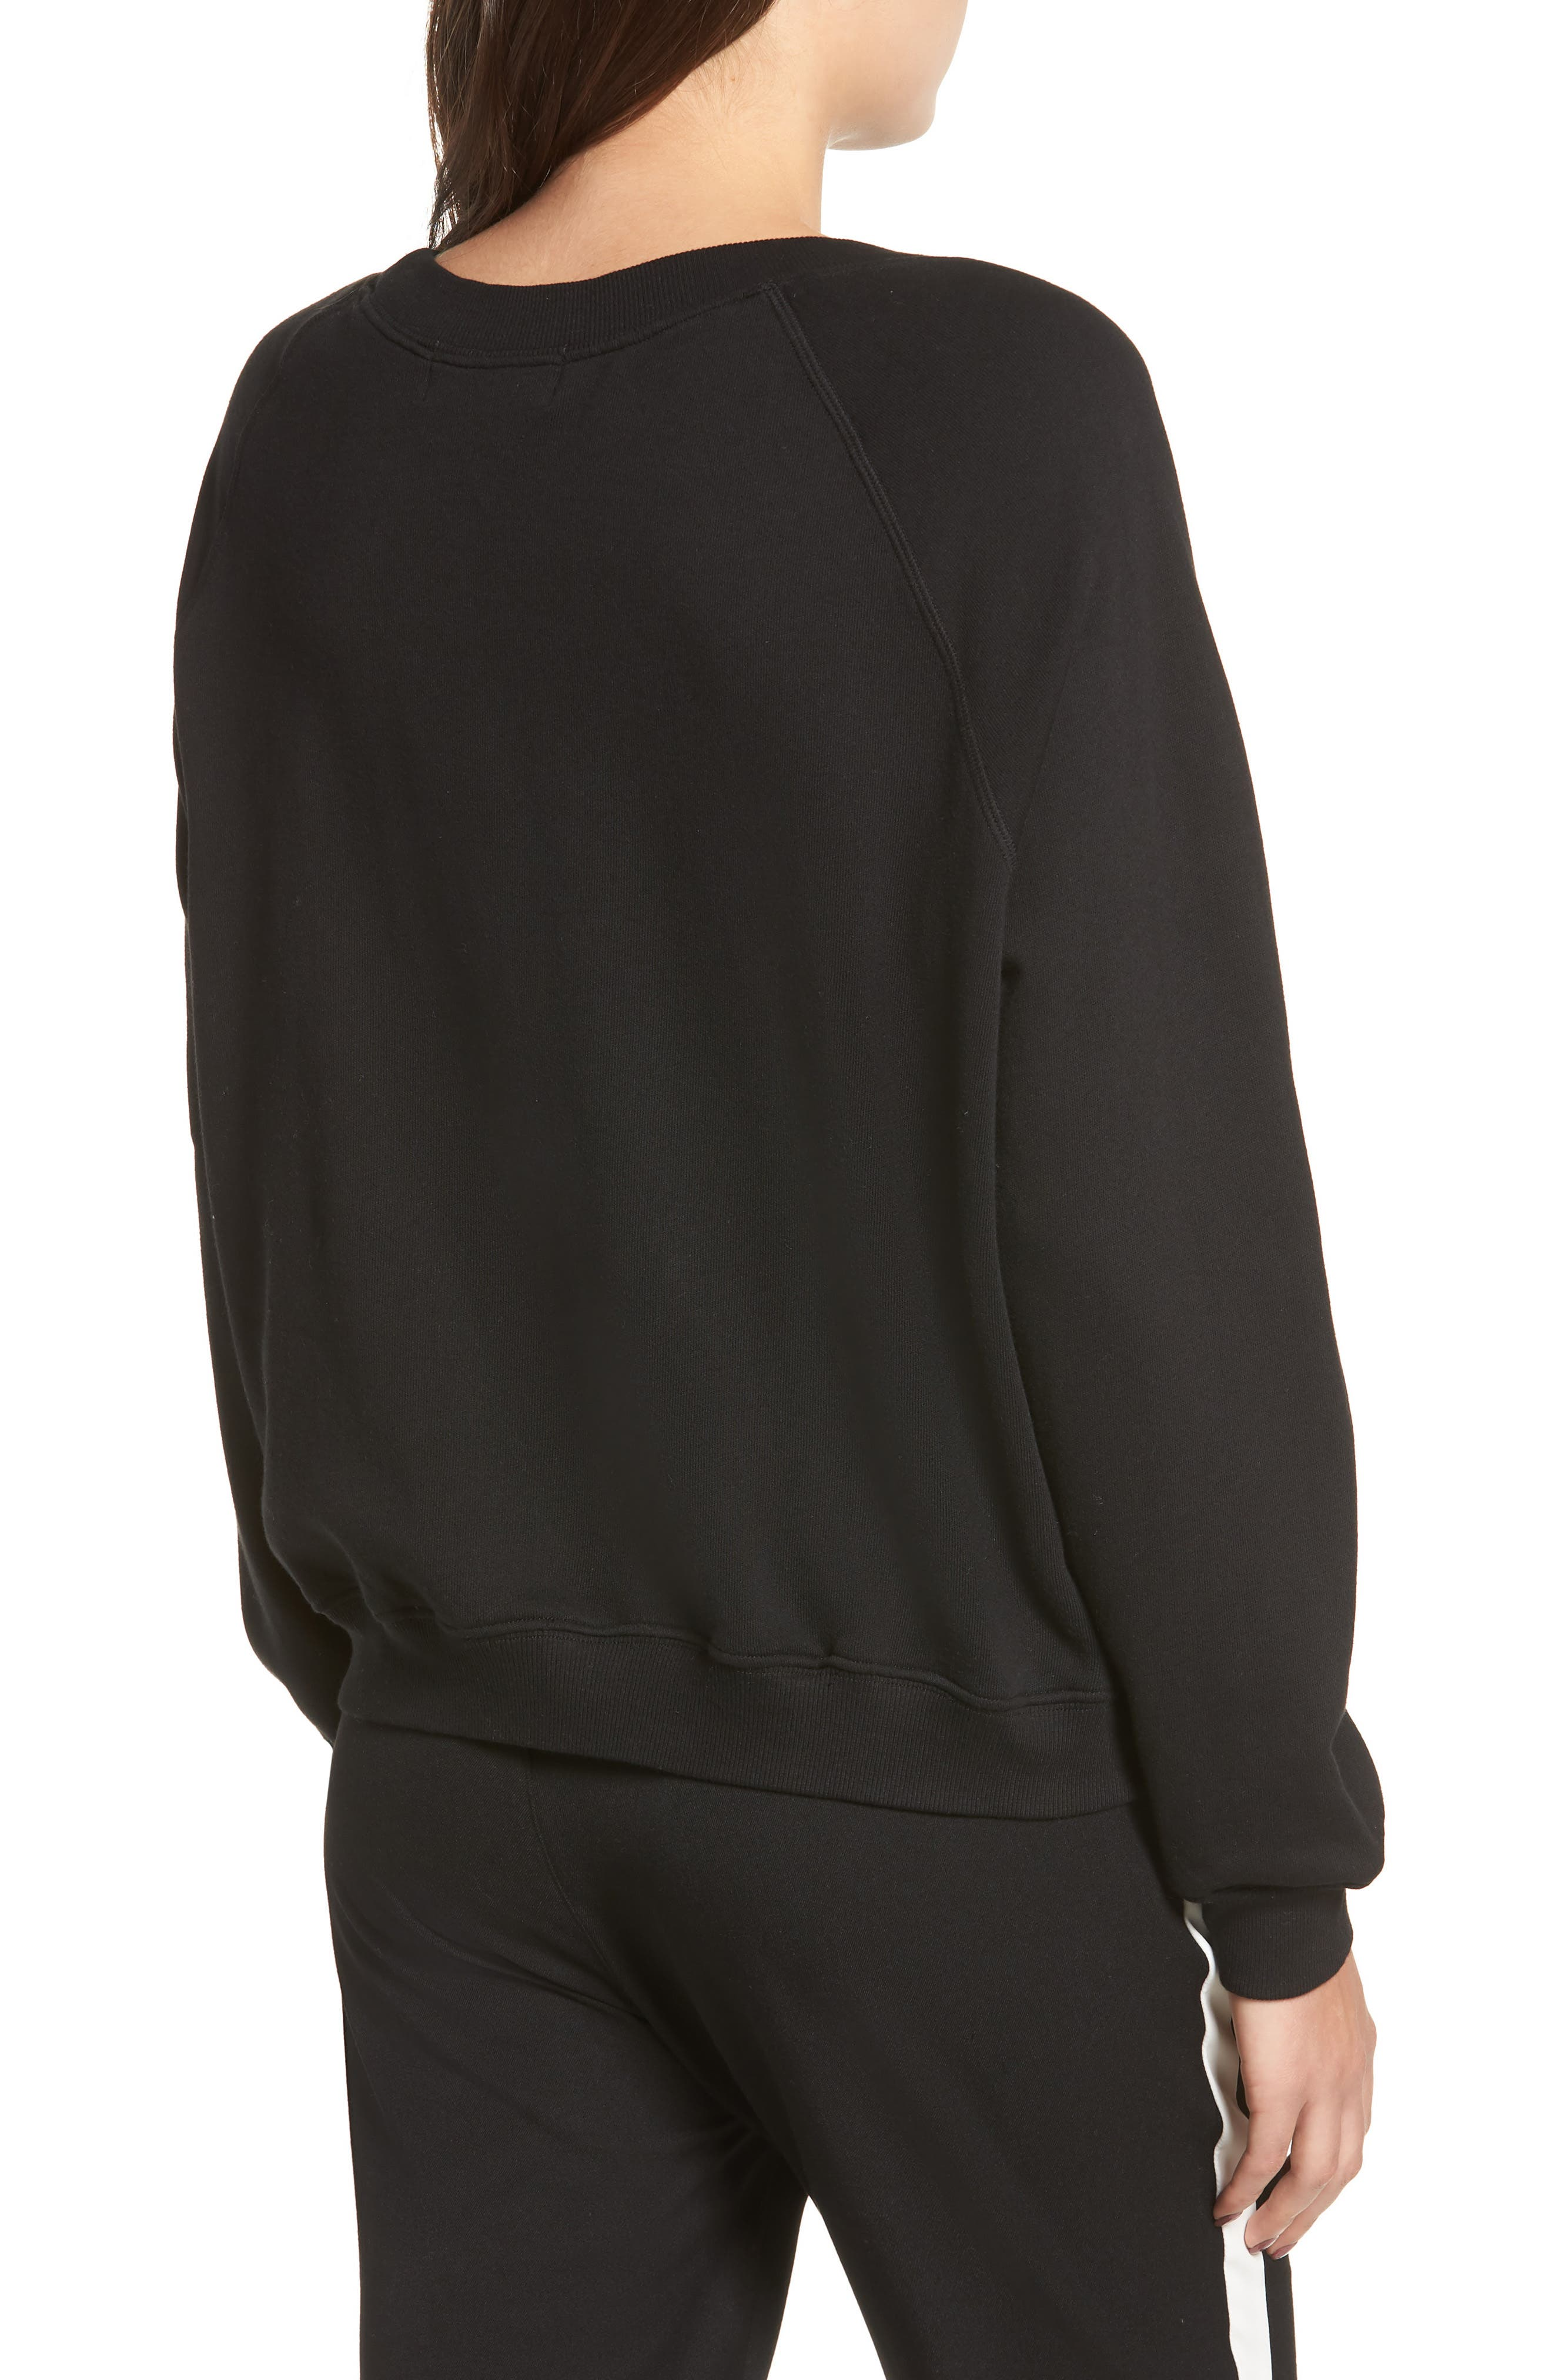 Beverly Hills Crest Sommers Sweatshirt,                             Alternate thumbnail 2, color,                             CLEAN BLACK